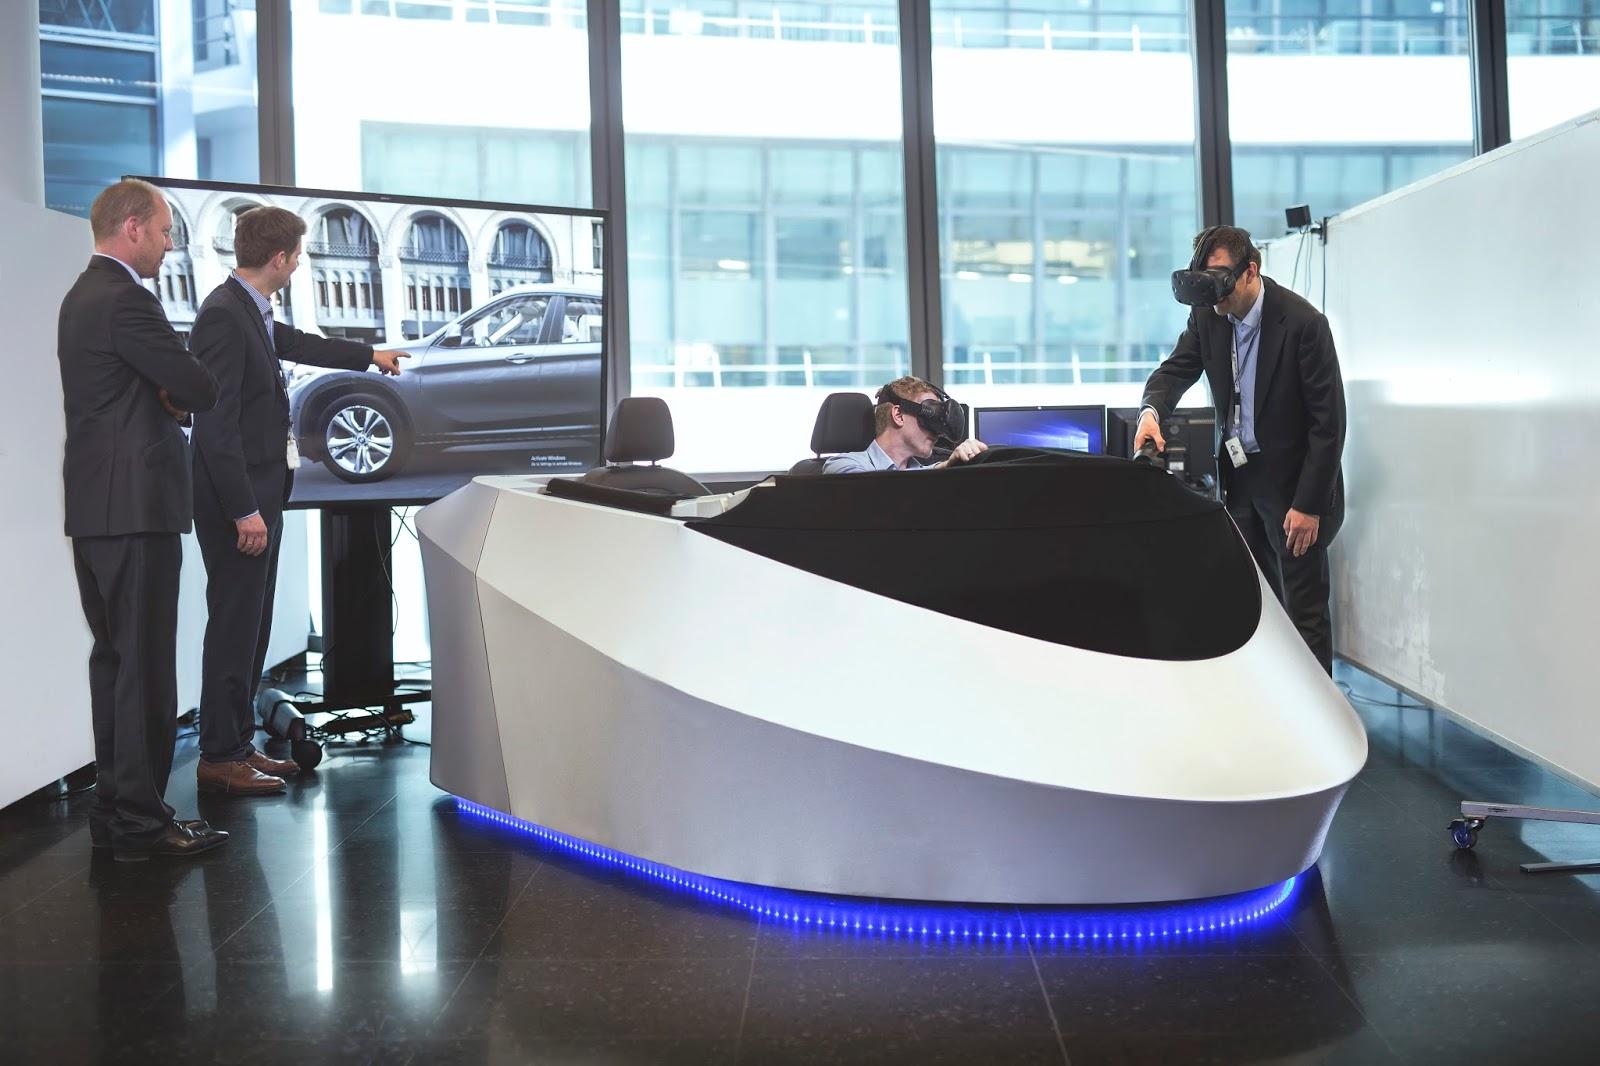 P90214934 highRes the virtual reality 1 1 Που χρησιμοποιεί η BMW το Unreal Engine 4 της Epic Games και τα συστήματα εικονικής πραγματικότητας BMW, HTC, Virtual Reality, Τεχνολογία